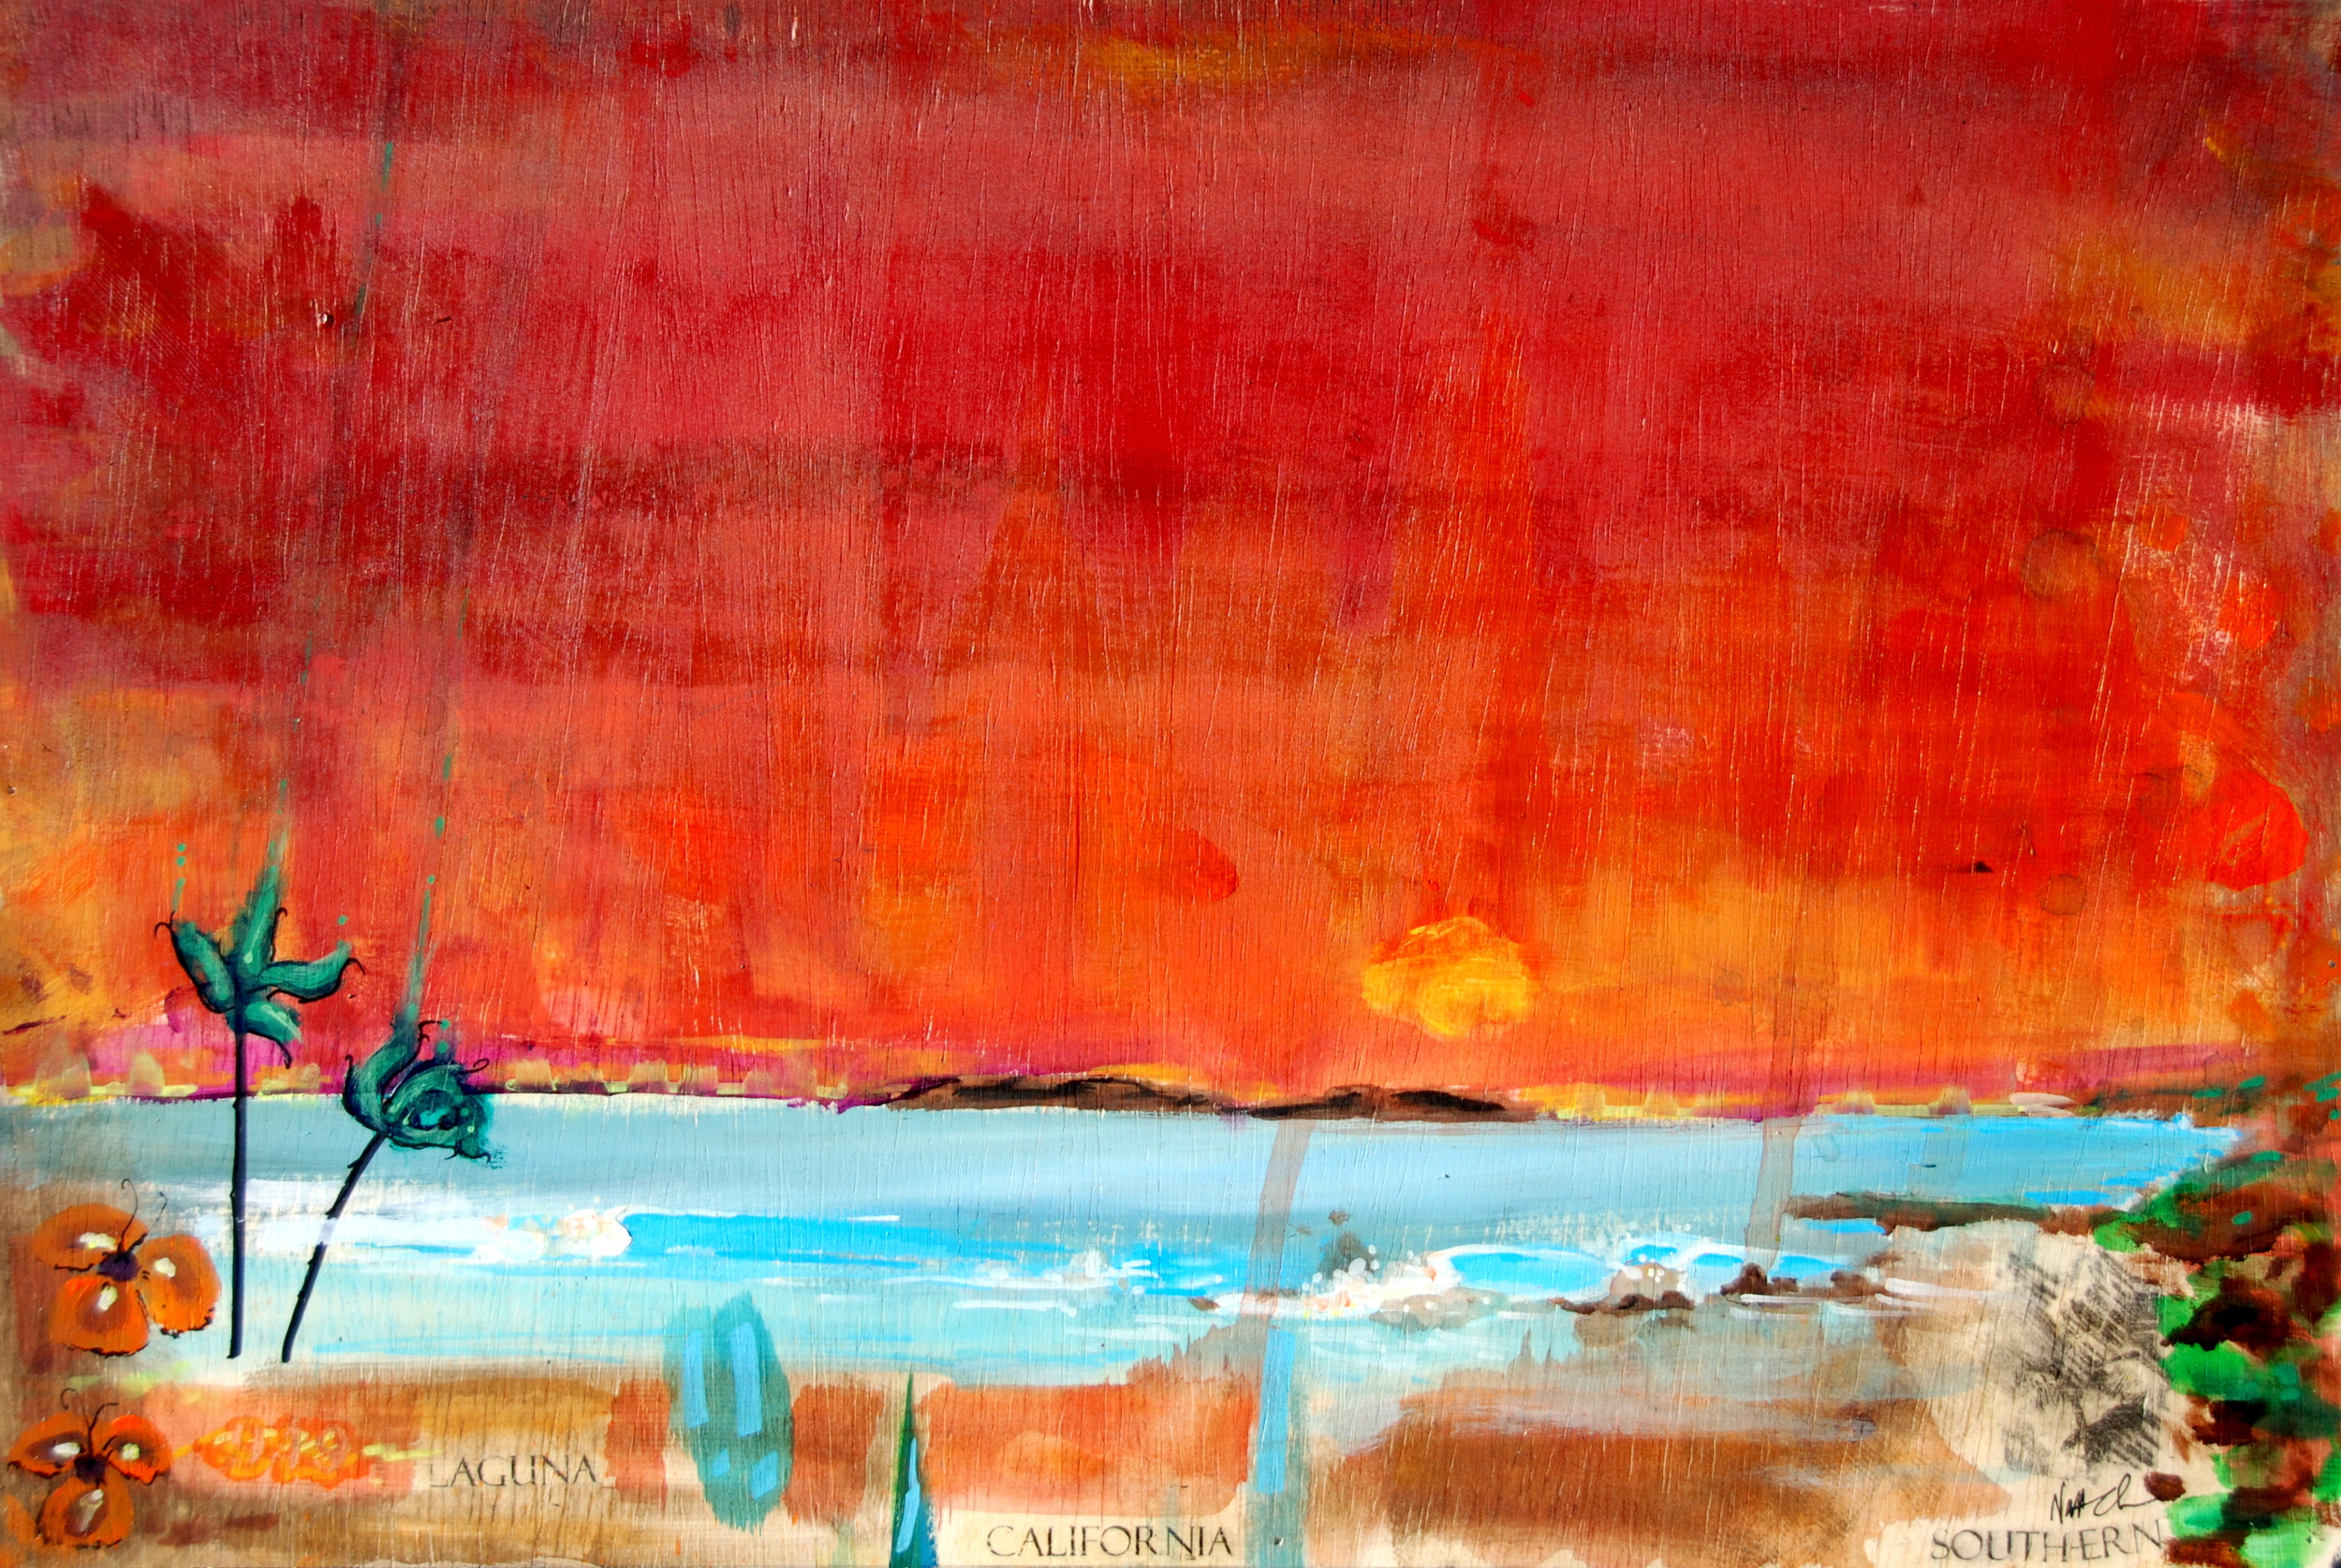 catalina smog II surf art.JPG